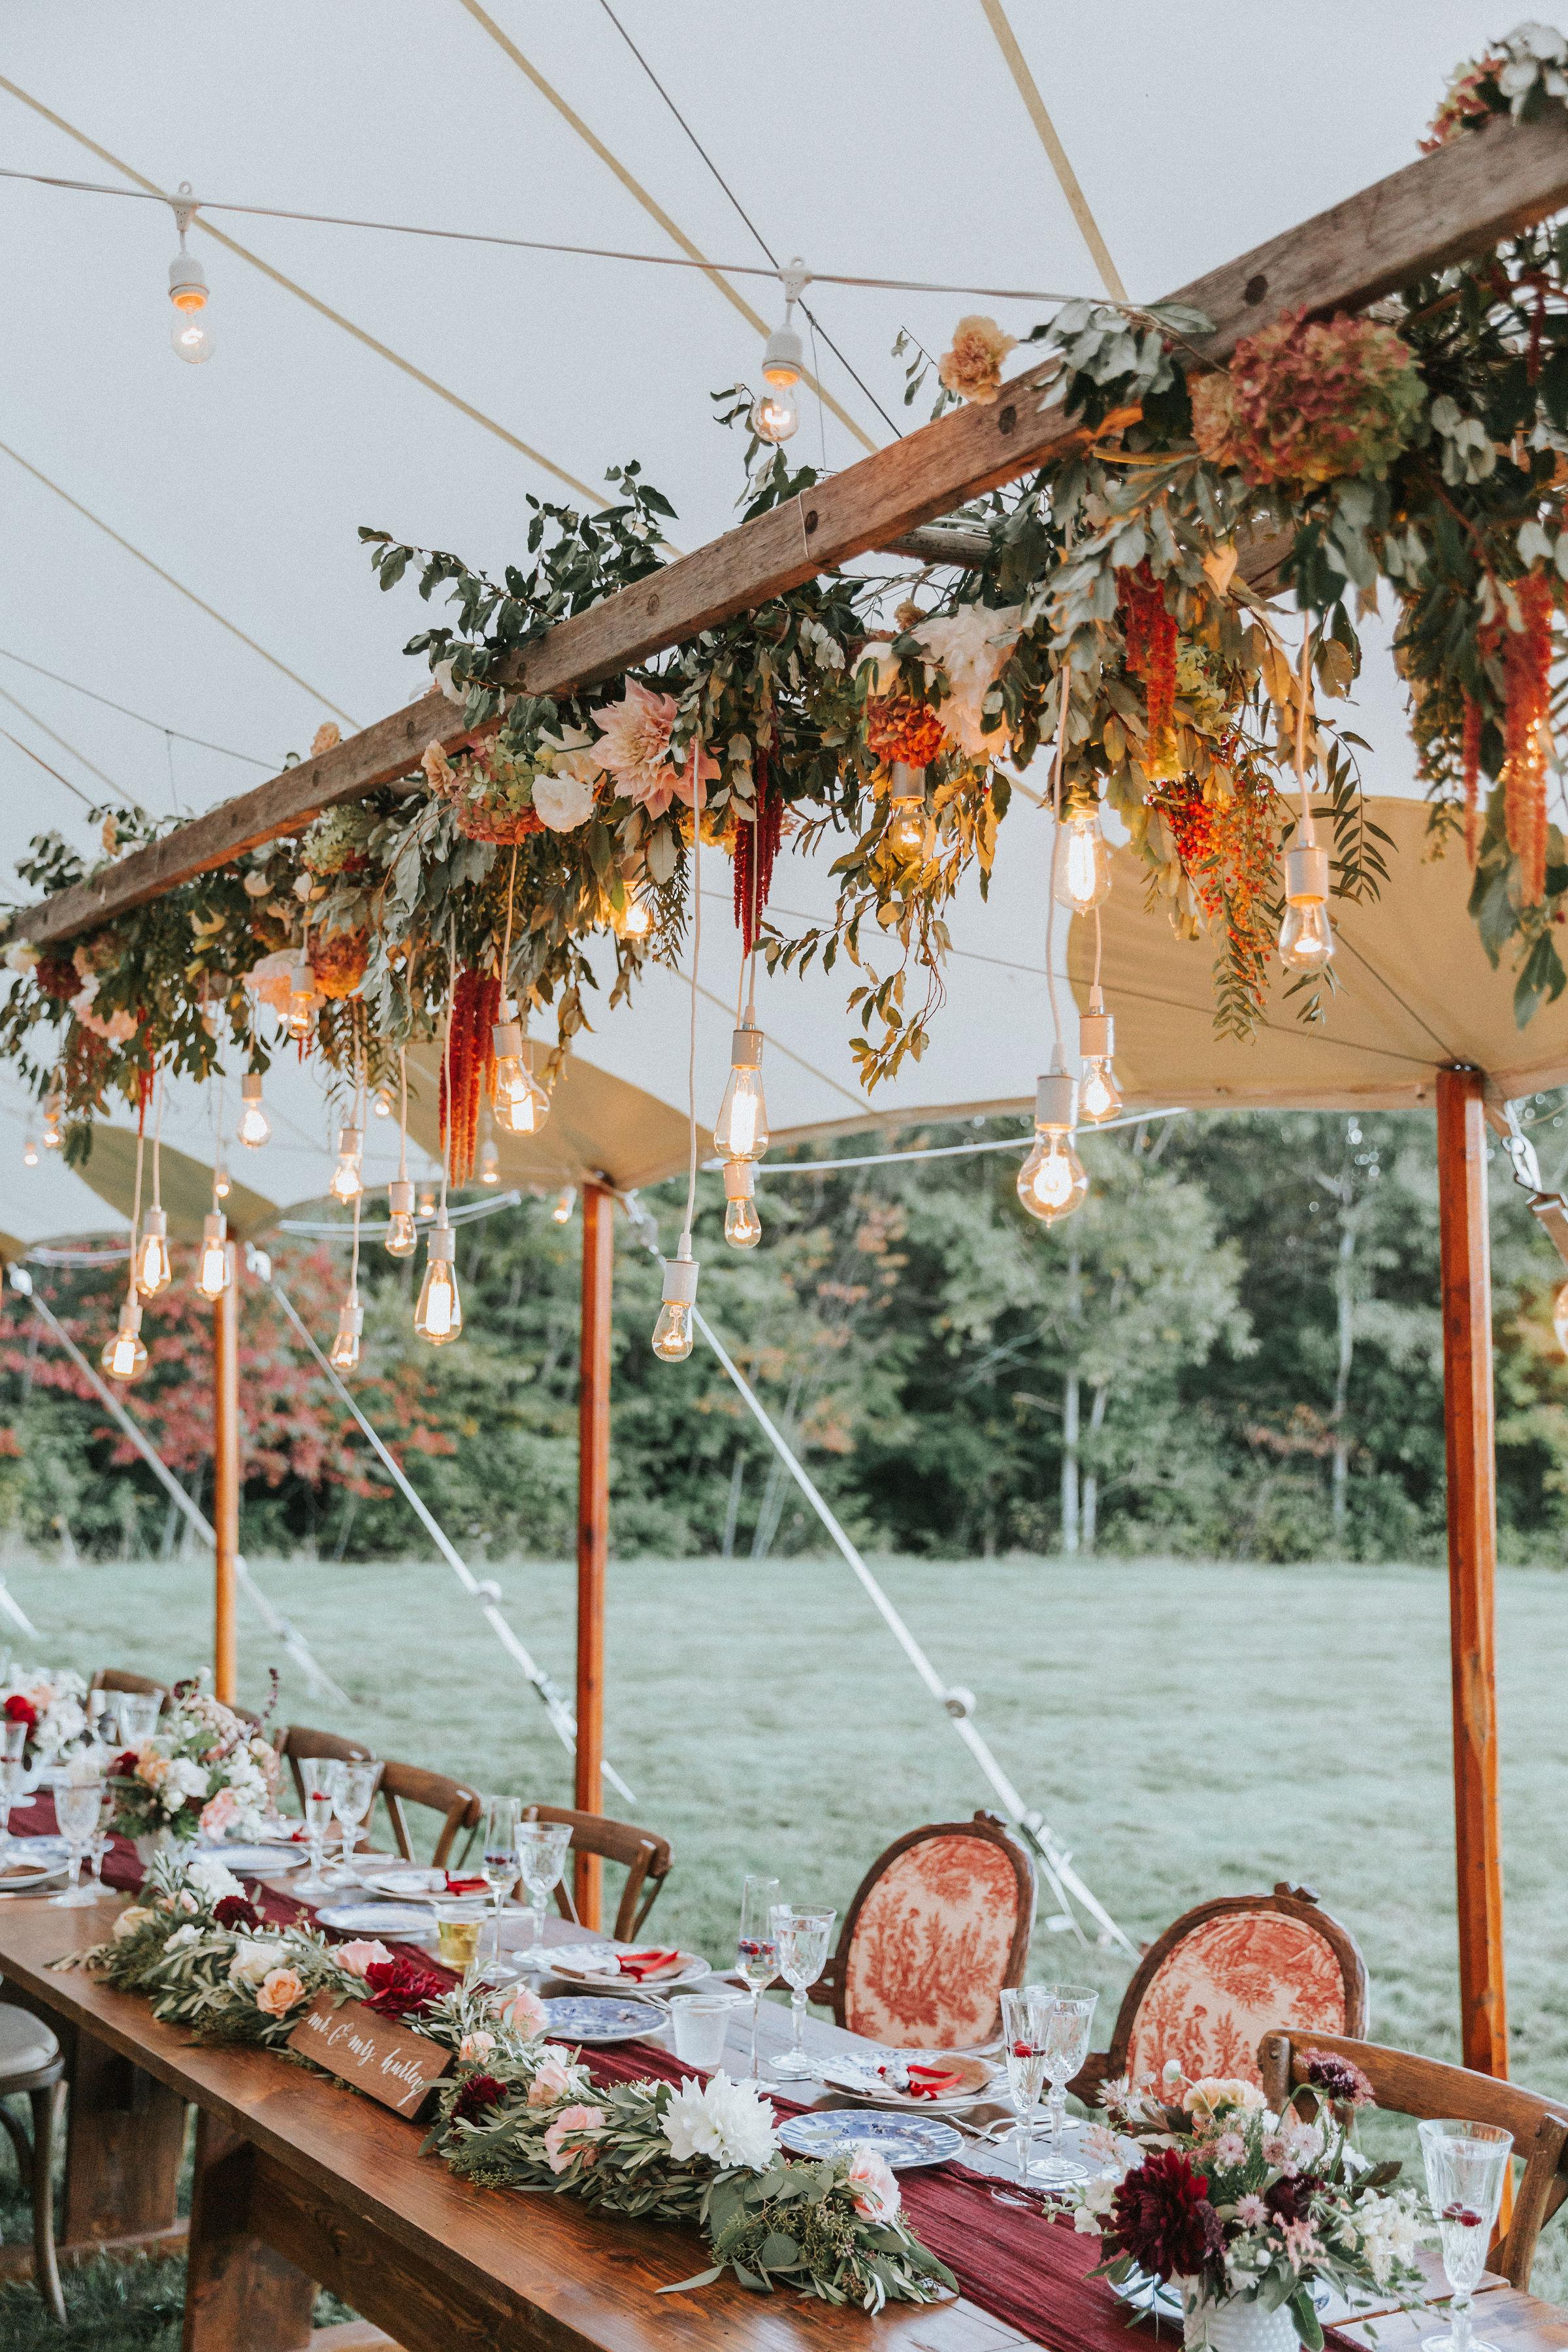 Allie_Greg_Beech_Hill_Barn_Wedding_Dinner-102.jpg